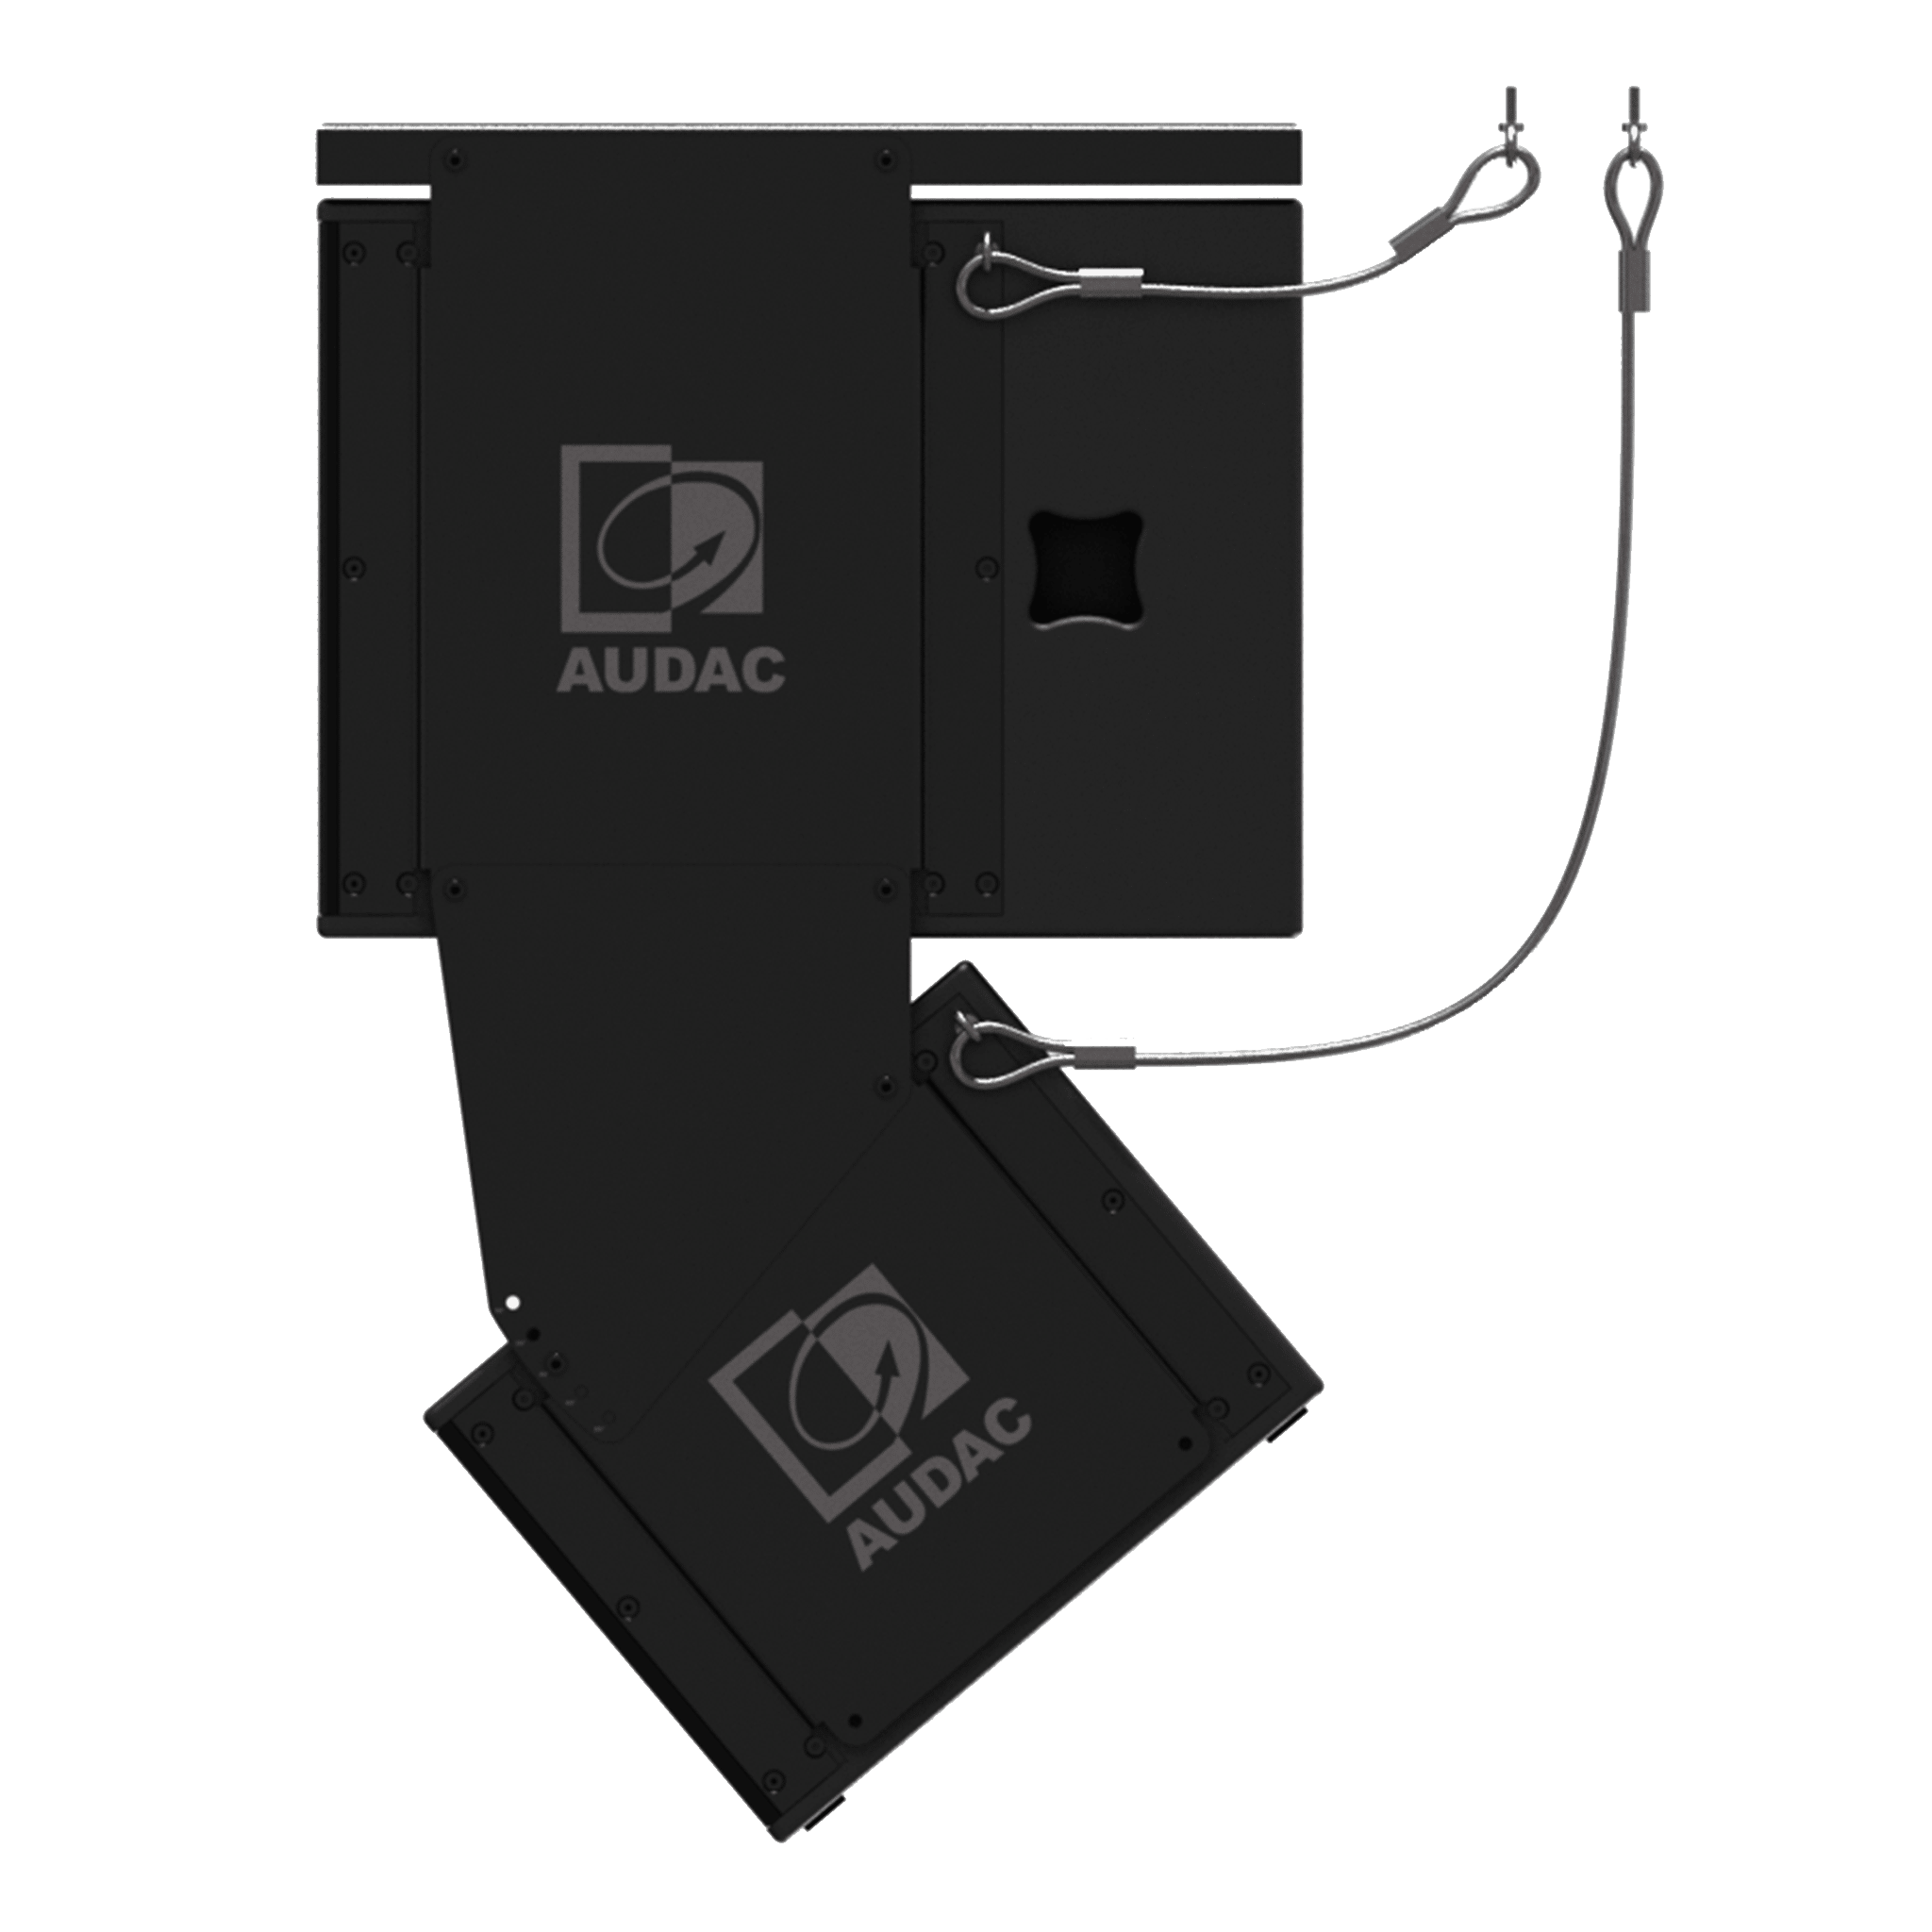 MBK302S - Ceiling flying system for 1x FX3.15 & 1x FX1.18 - black